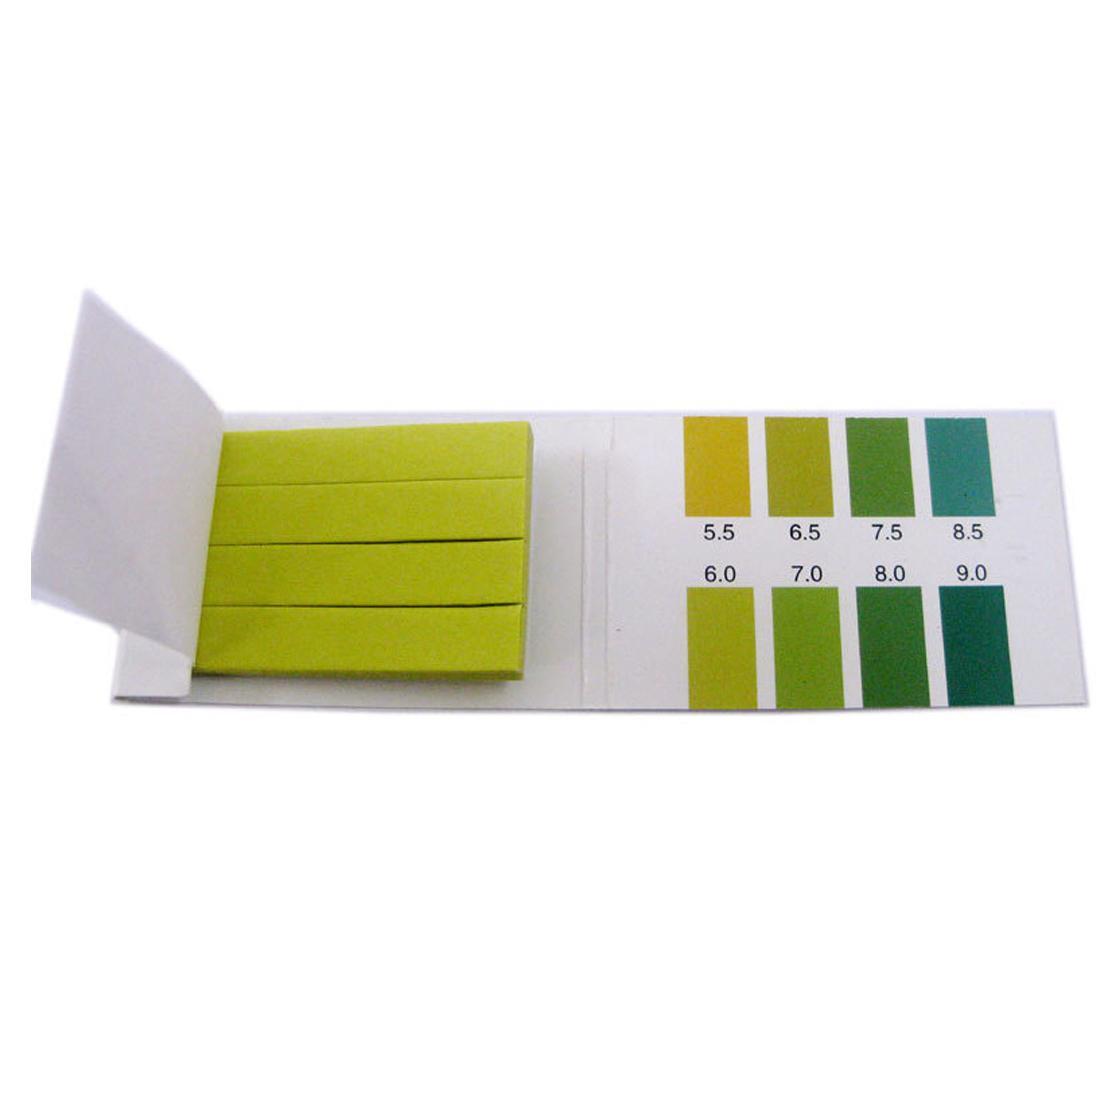 Buy Sell Cheapest Kertas Saring Laboratorium Best Quality Product Lakmus Ph Tester 80 Strip Kisaran 55